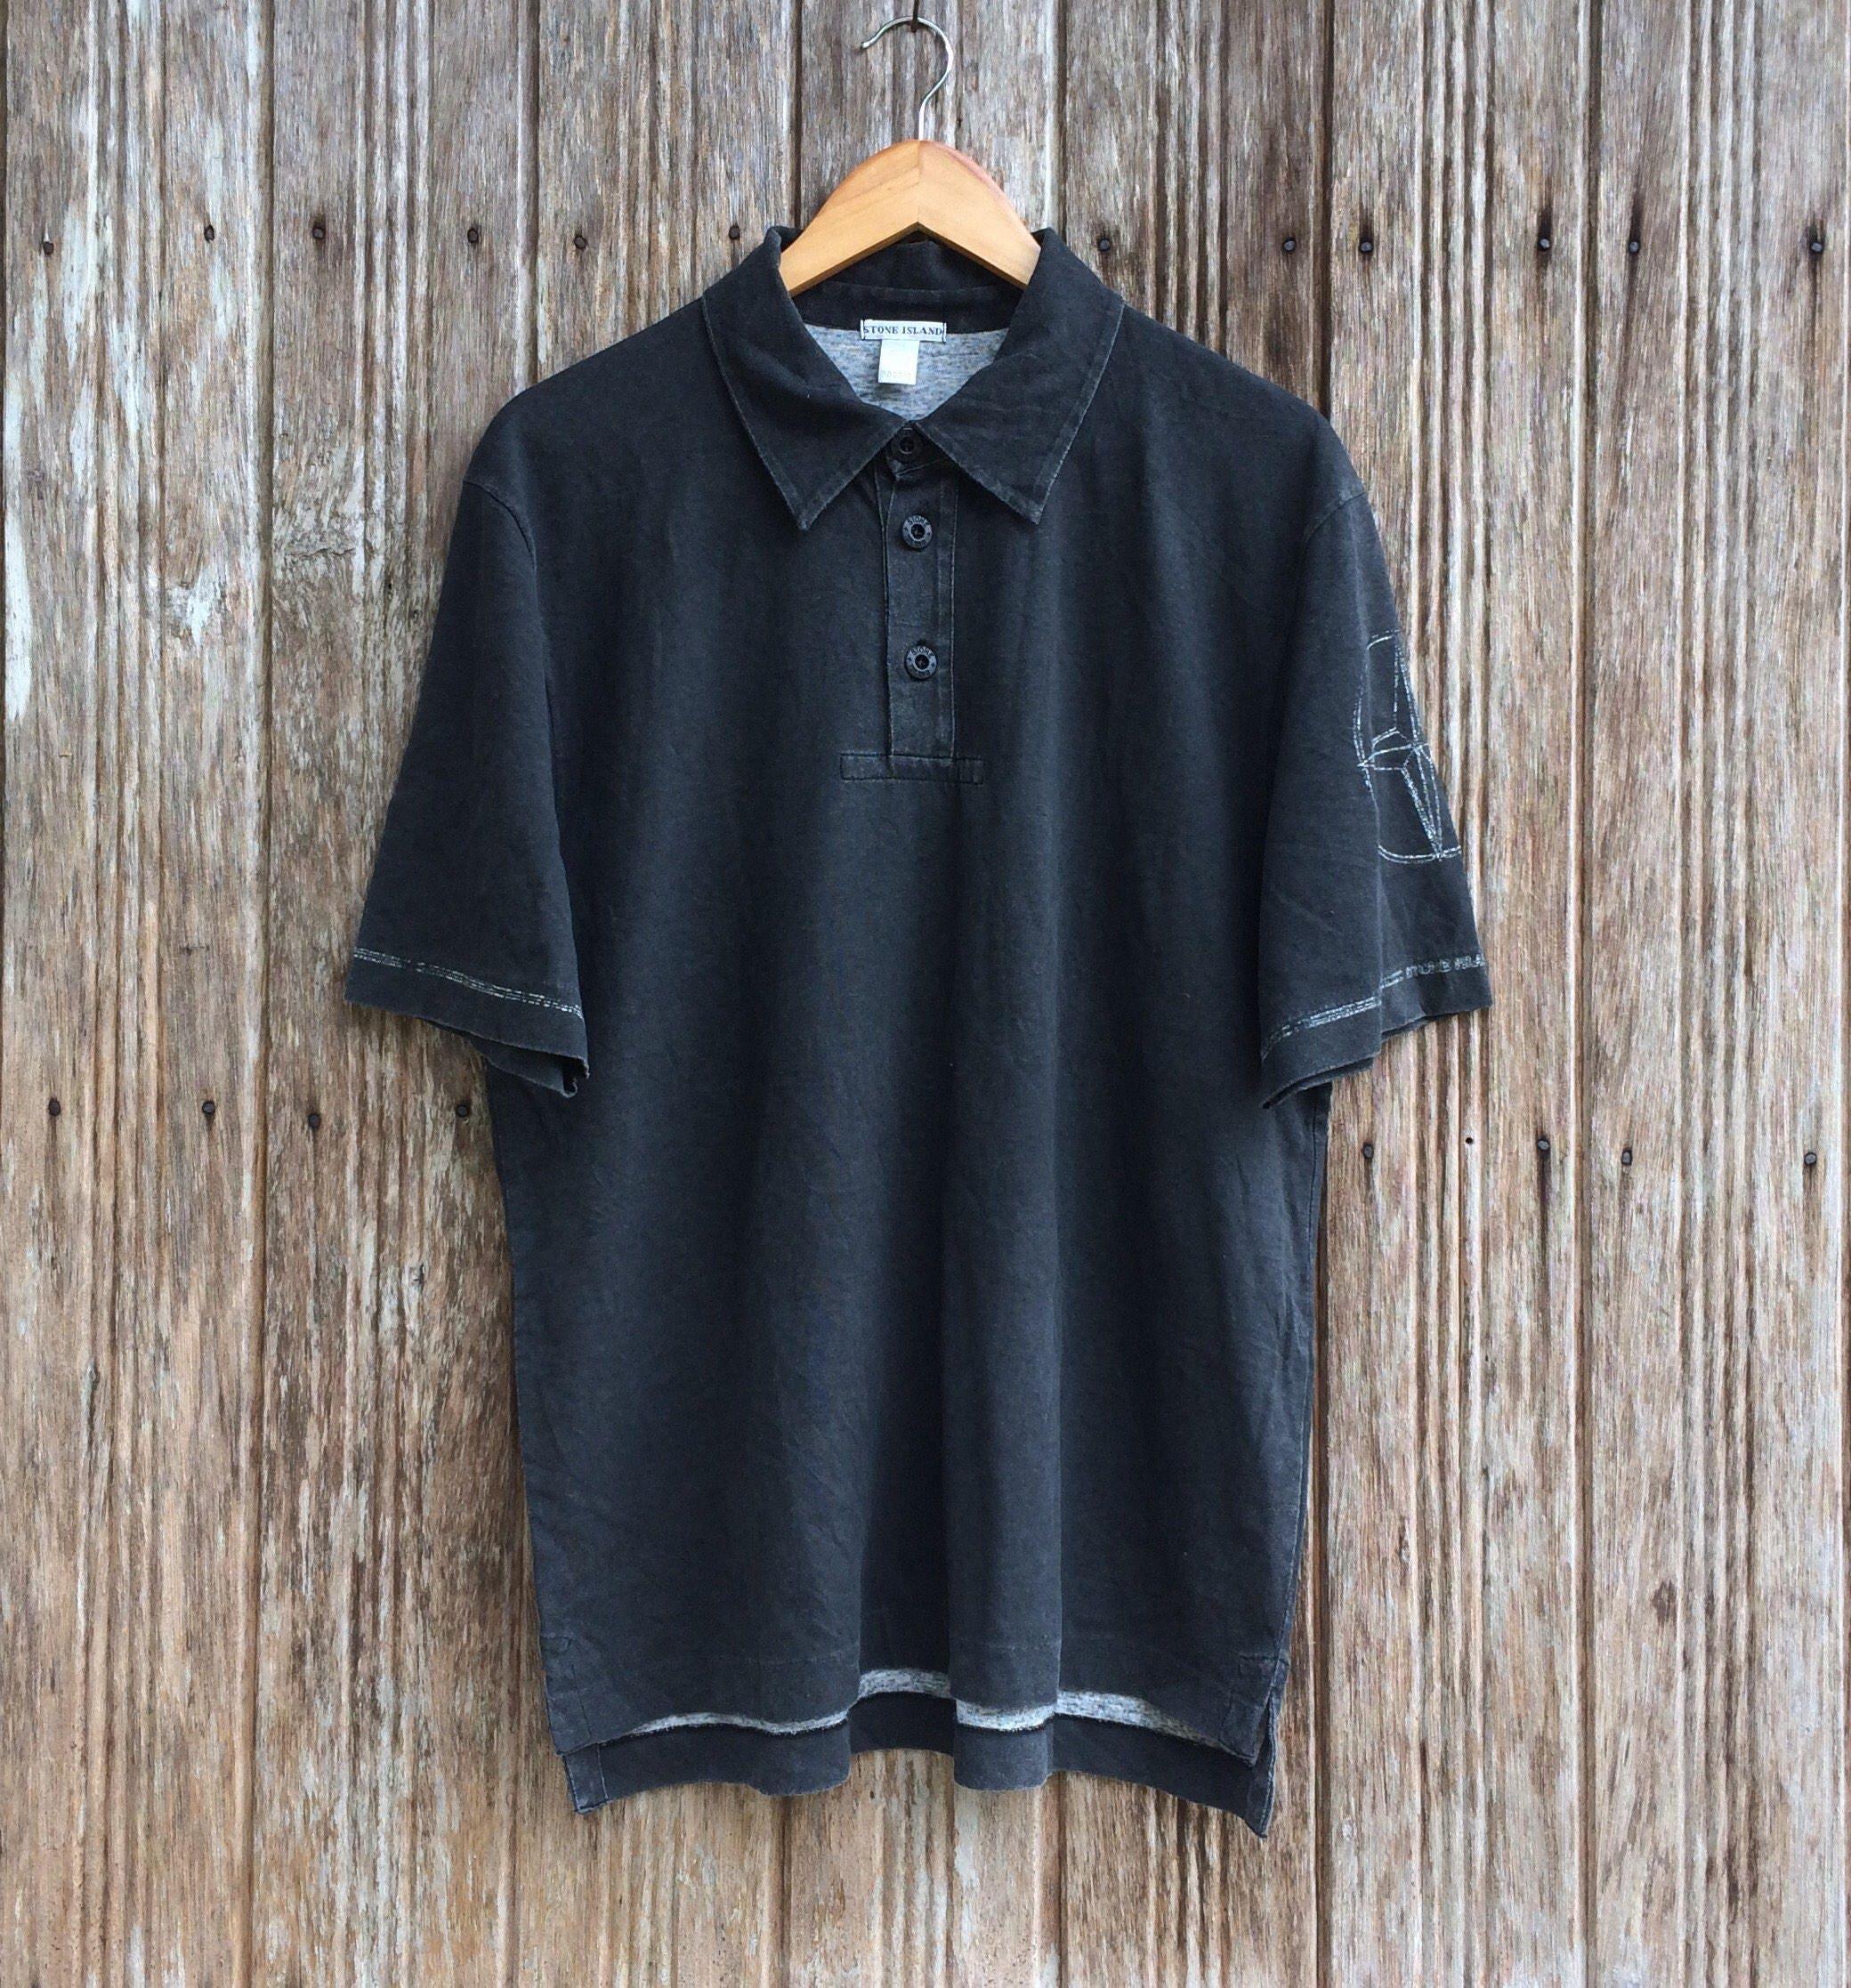 Polo shirt design editor - 20 Off Rare Vintage Stone Island Button Down Shirt Stone Island Sportswear Streetwear Style Shirt Size M L